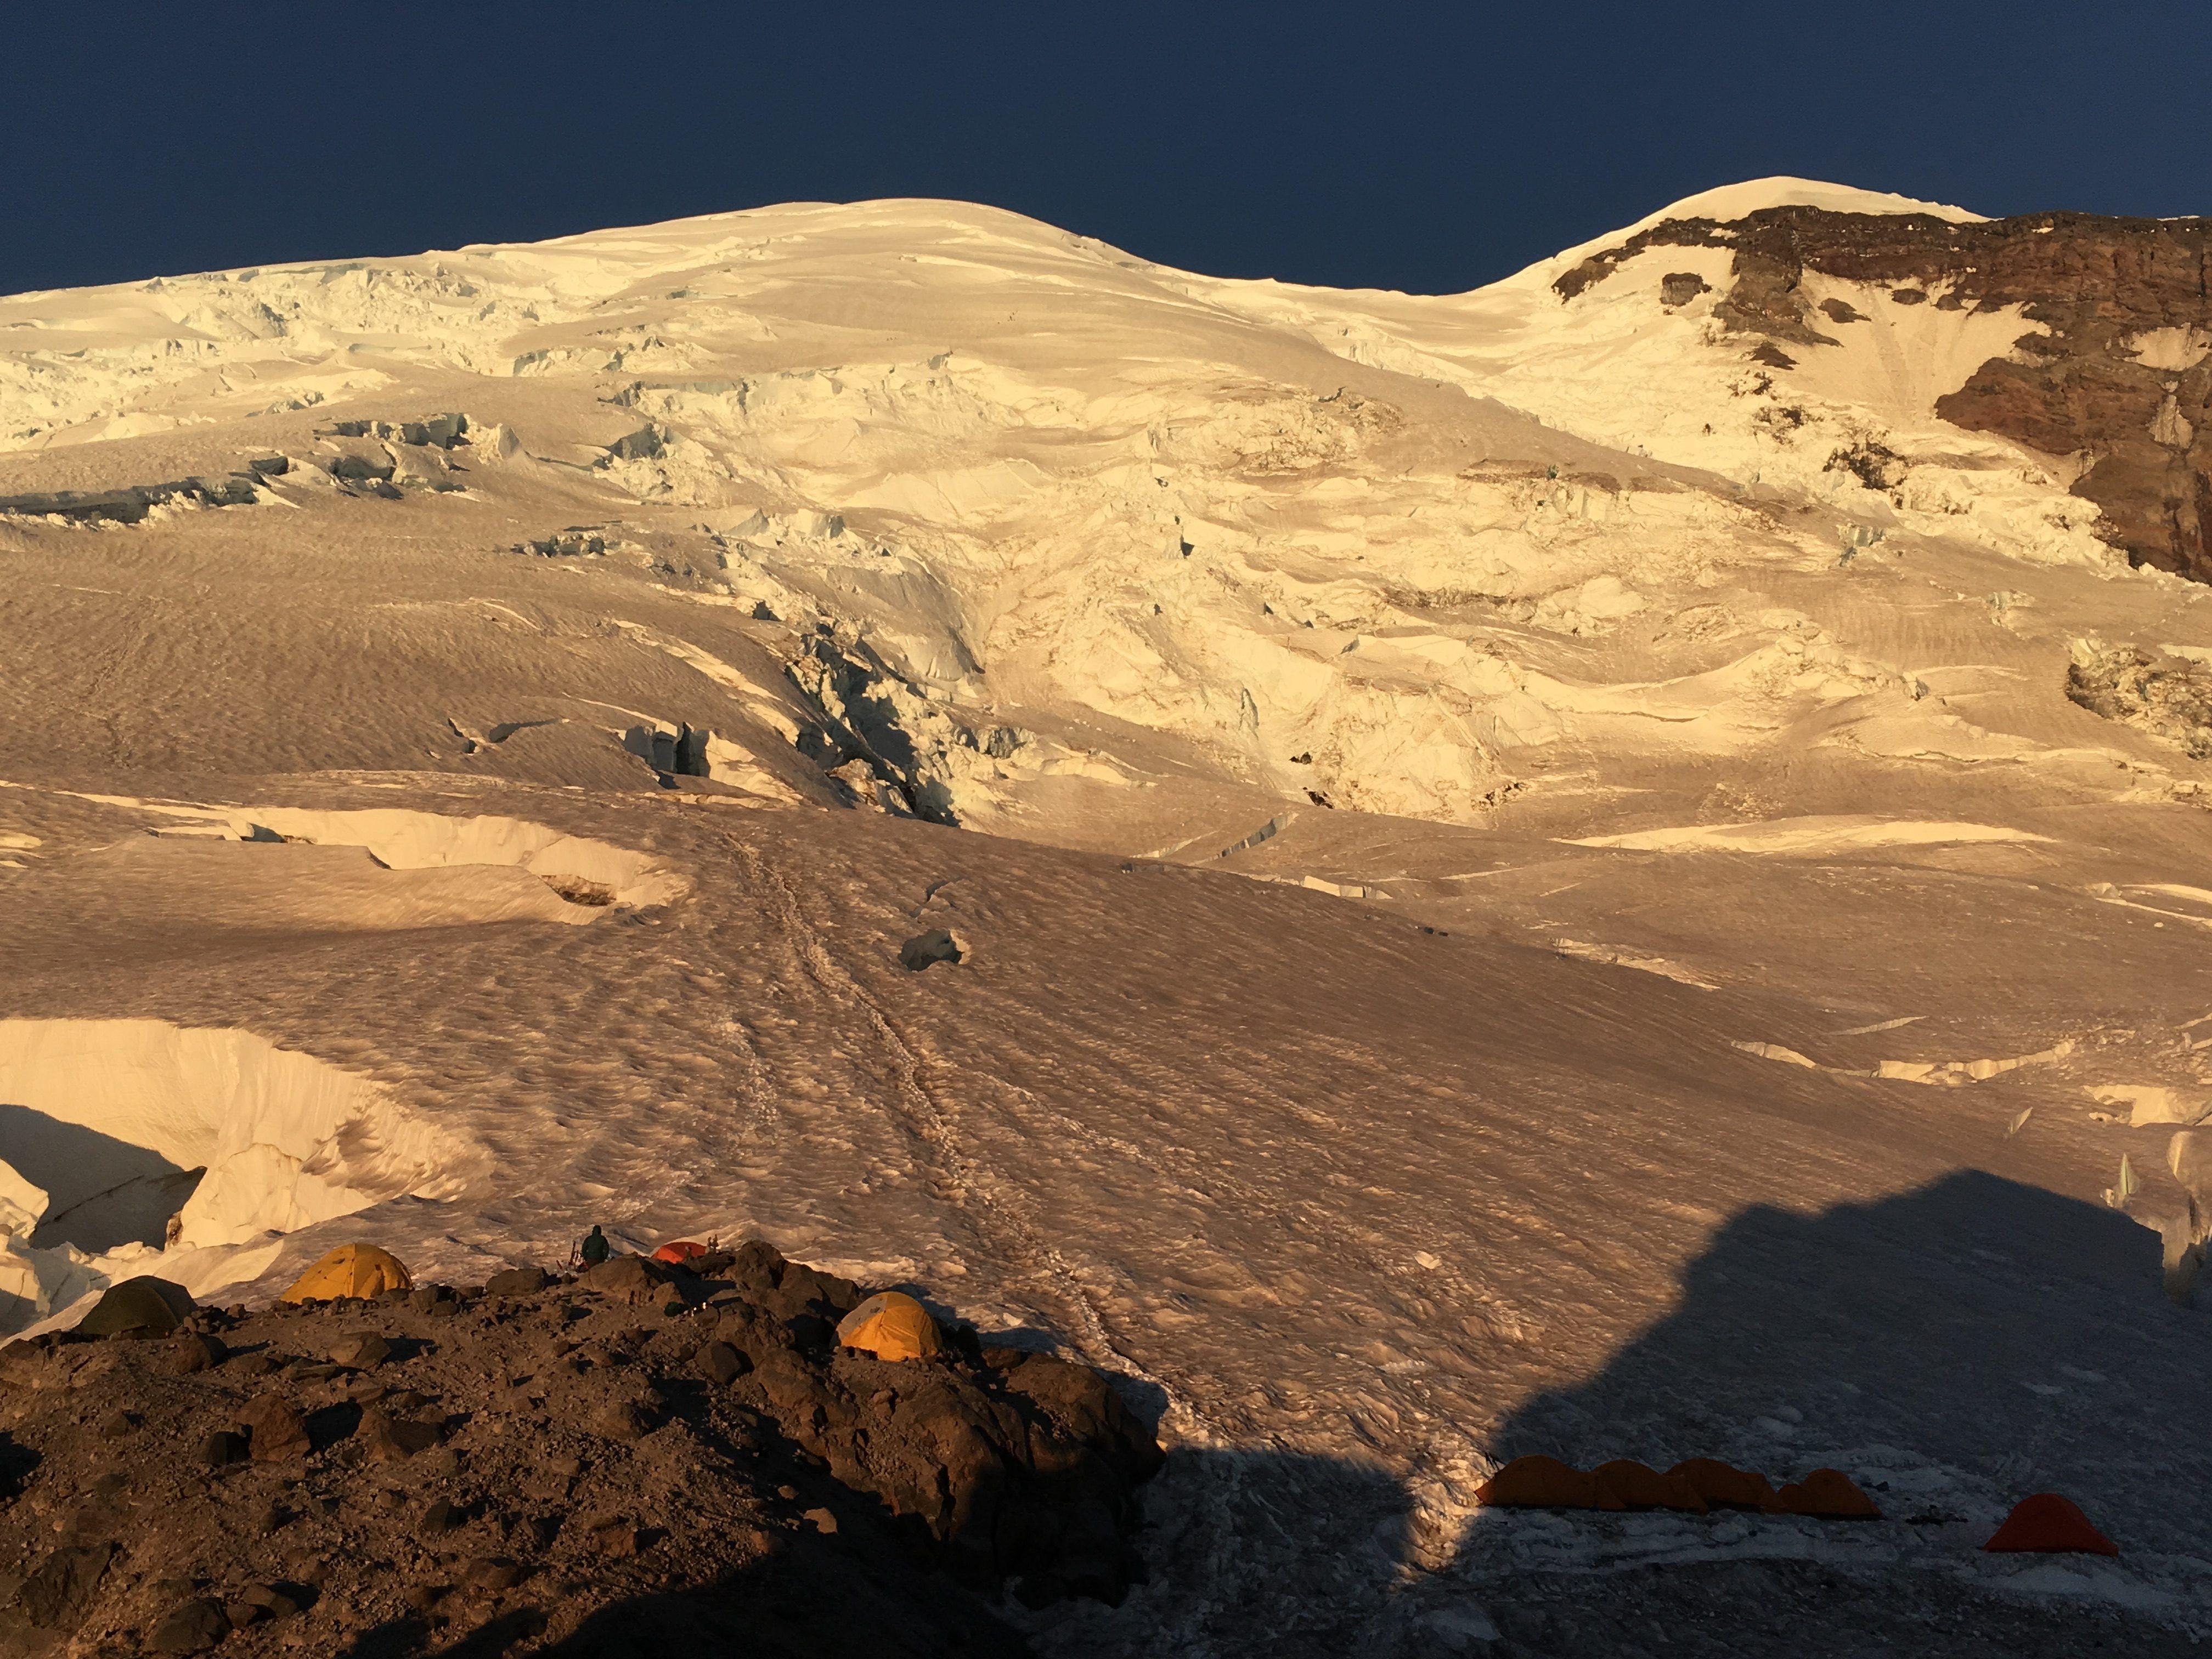 Mount Rainer Camp Sherman